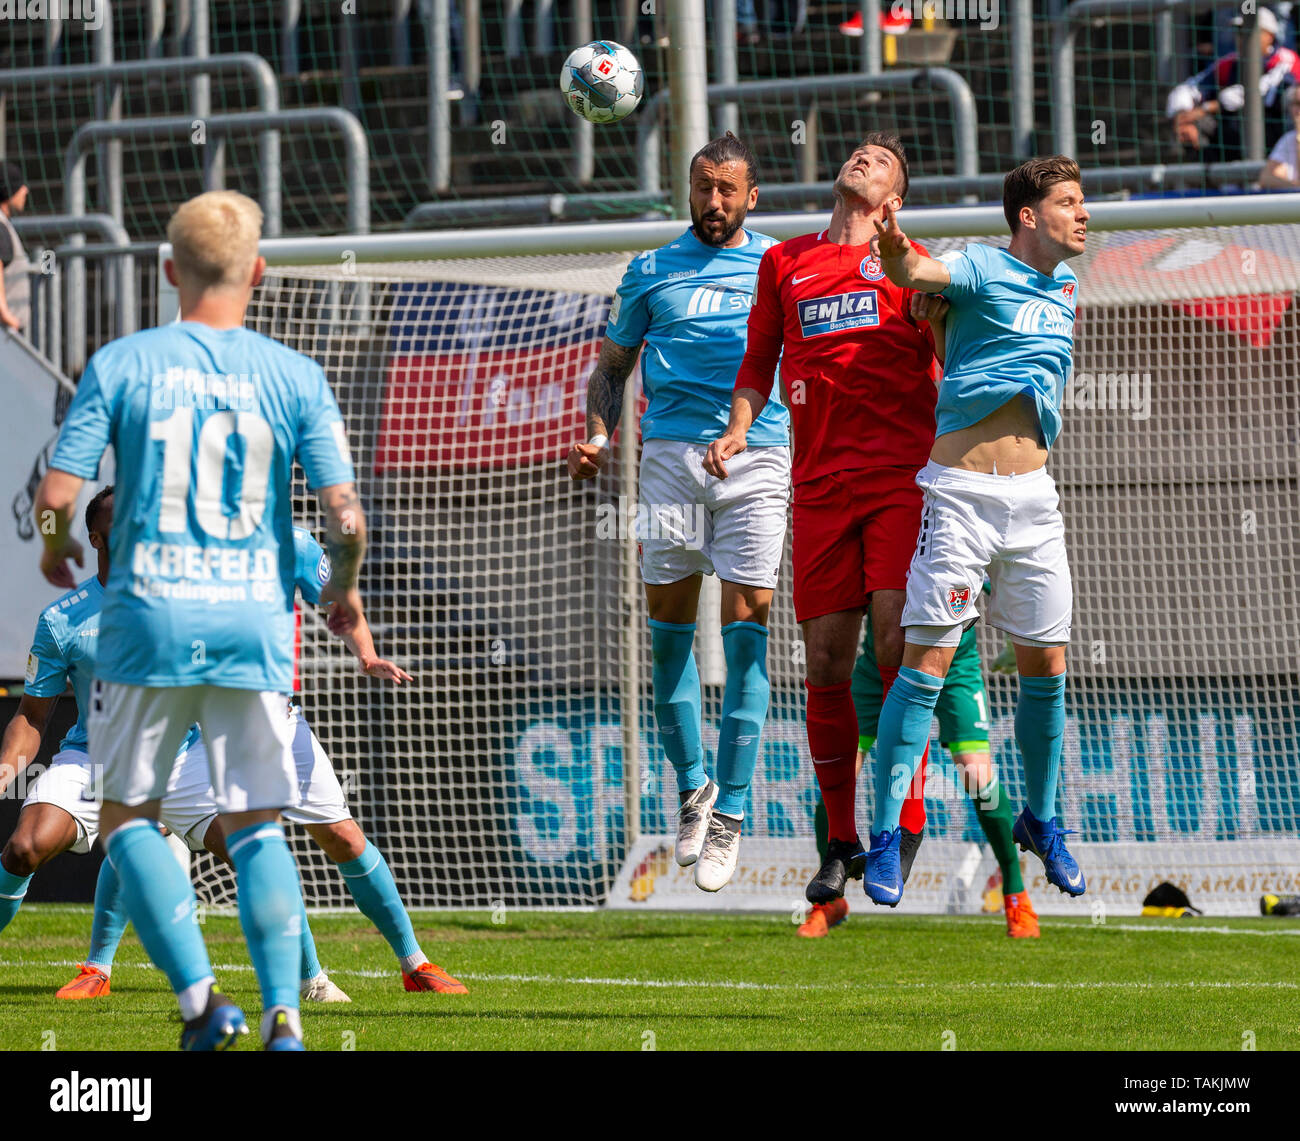 Sport, Fussball, Reviersport Niederrheinpokal, 2018/2019, Finale, Wuppertaler SV vs. KFC Uerdingen 1-2, Stadion Am Zoo in Wuppertal, Spielszene, v.l.n.r. Patrick Pfluecke (KFC), Dominic Maroh (KFC), Gino Windmueller (WSV), Christian Dorda (KFC), sports, football, Lower Rhine Cup, 2018/2019, final, Wuppertaler SV vs. KFC Uerdingen 1-2, Stadium Am Zoo in Wuppertal, scene of the match, f.l.t.r. Patrick Pfluecke (KFC), Dominic Maroh (KFC), Gino Windmueller (WSV), Christian Dorda (KFC) *** Local Caption *** sports, football, Lower Rhine Cup, 2018/2019, final, Wuppertaler SV vs. KFC Uerdingen 1-2, S - Stock Image